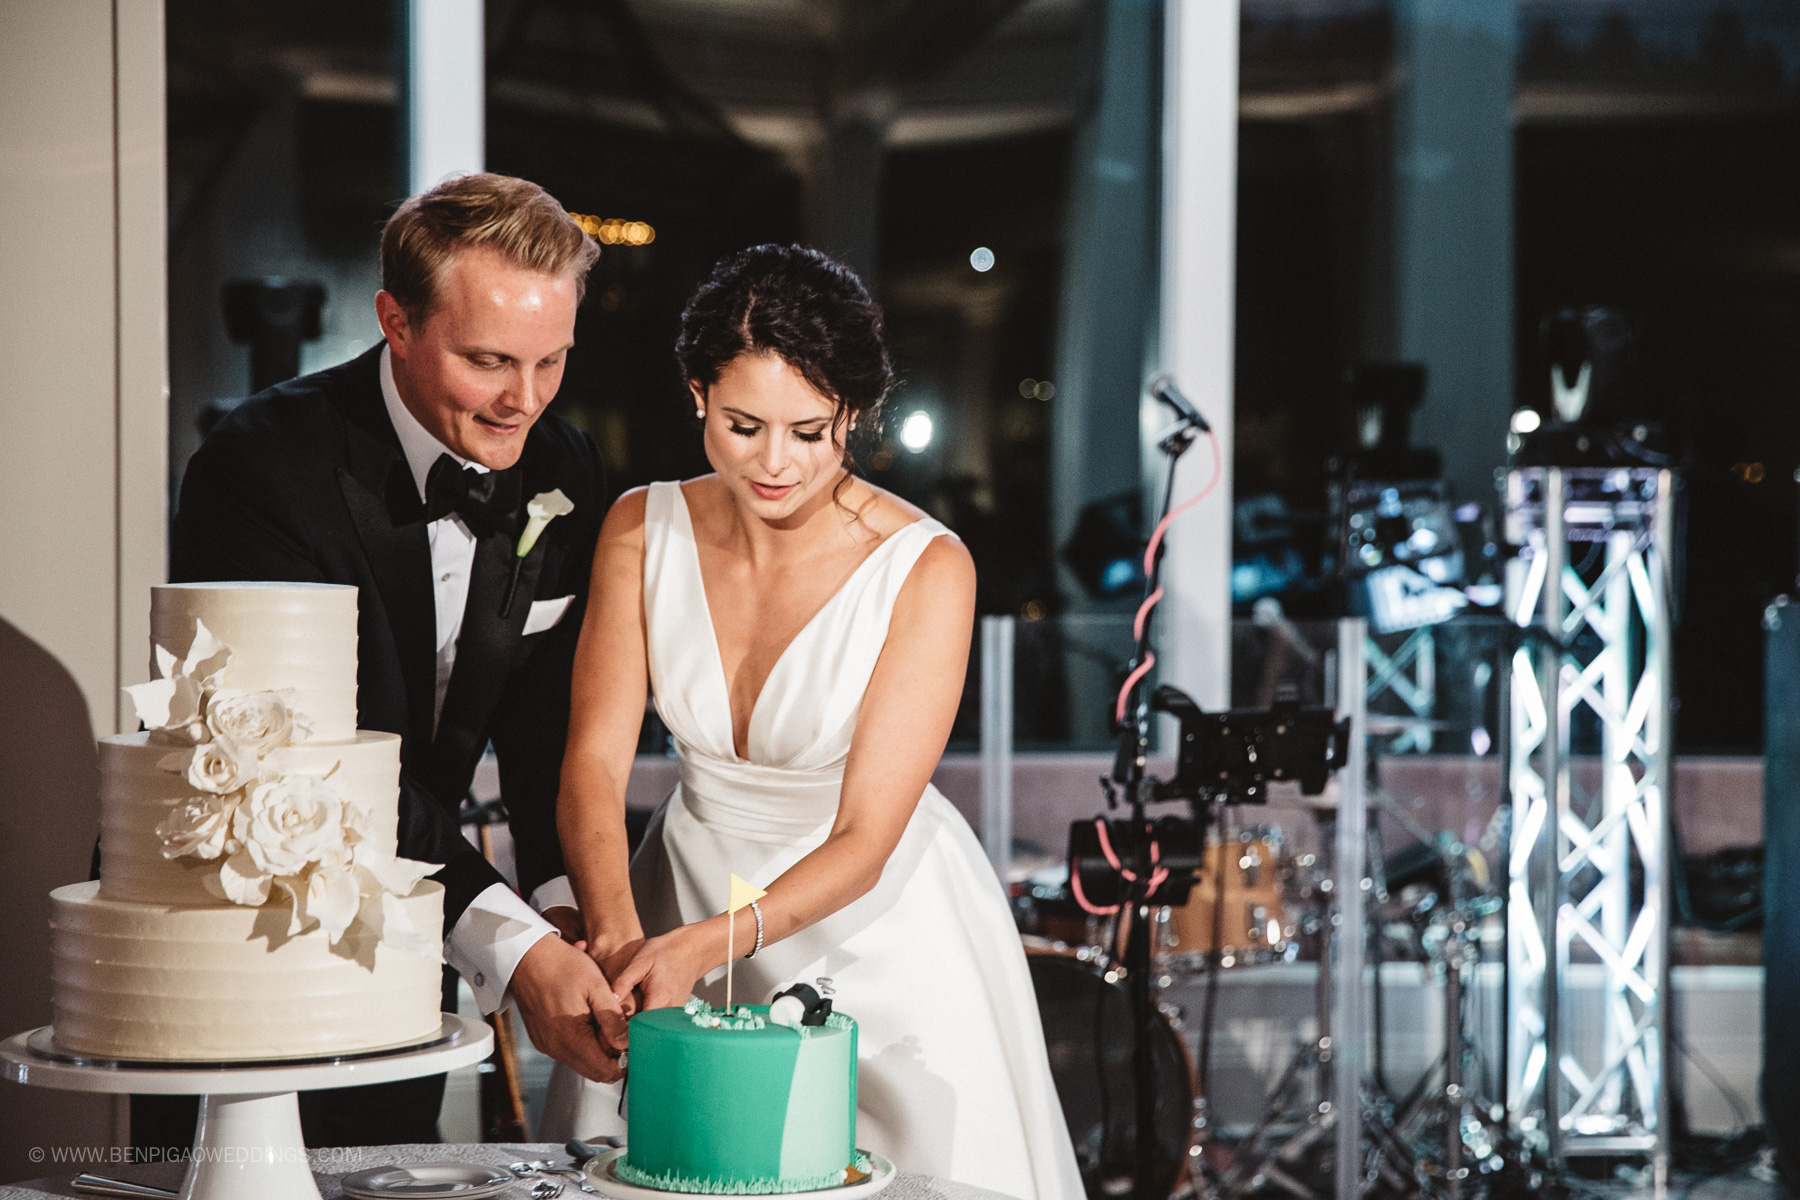 Simple White Wedding Cakes - Portland, Oregon Waverley Country Club Wedding